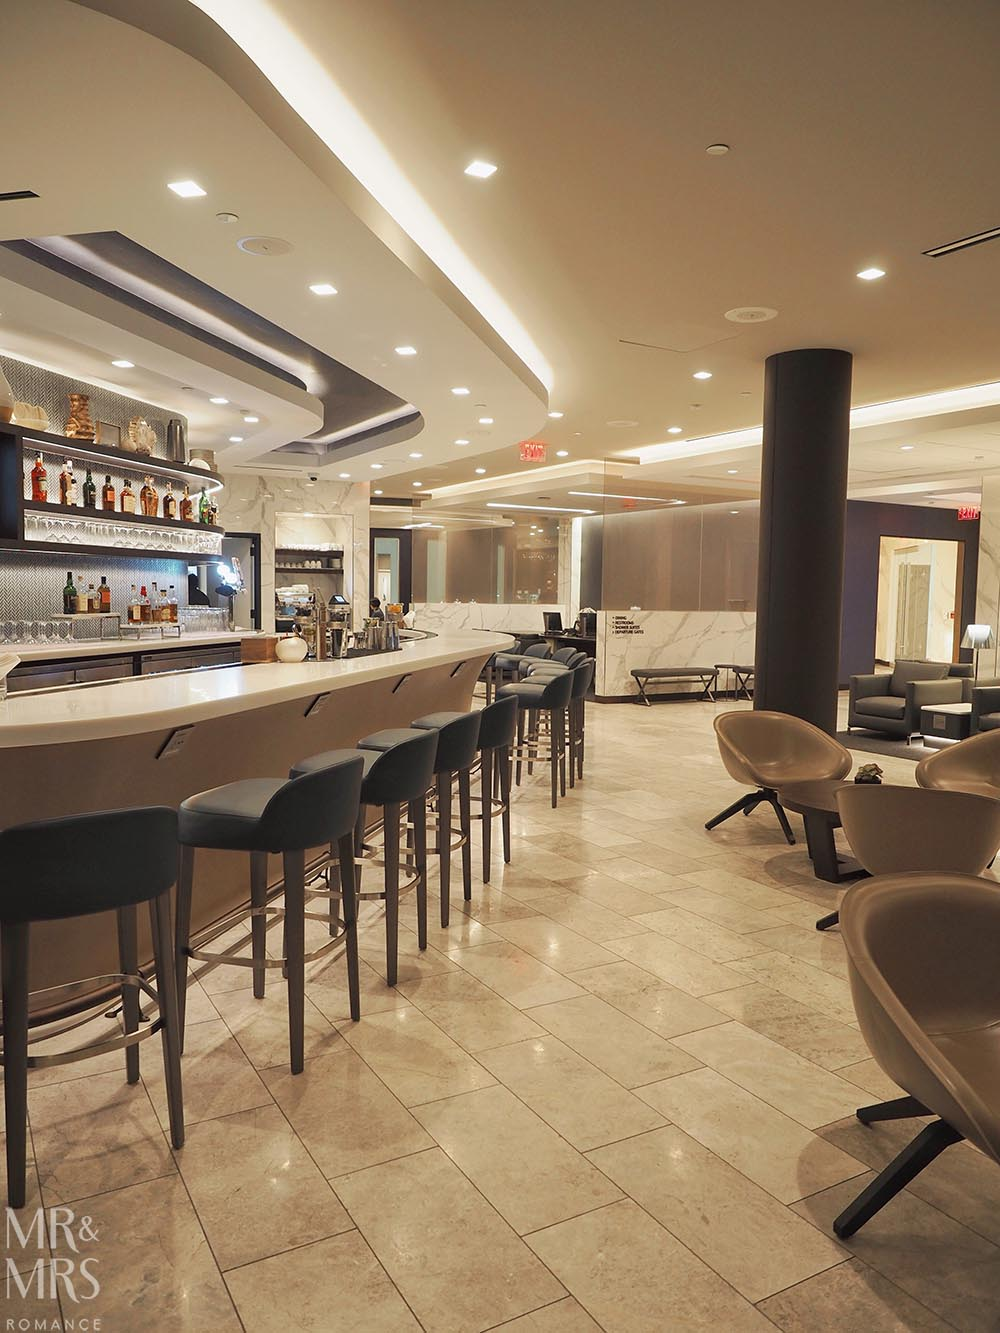 Polaris Business Class Lounge, LAX